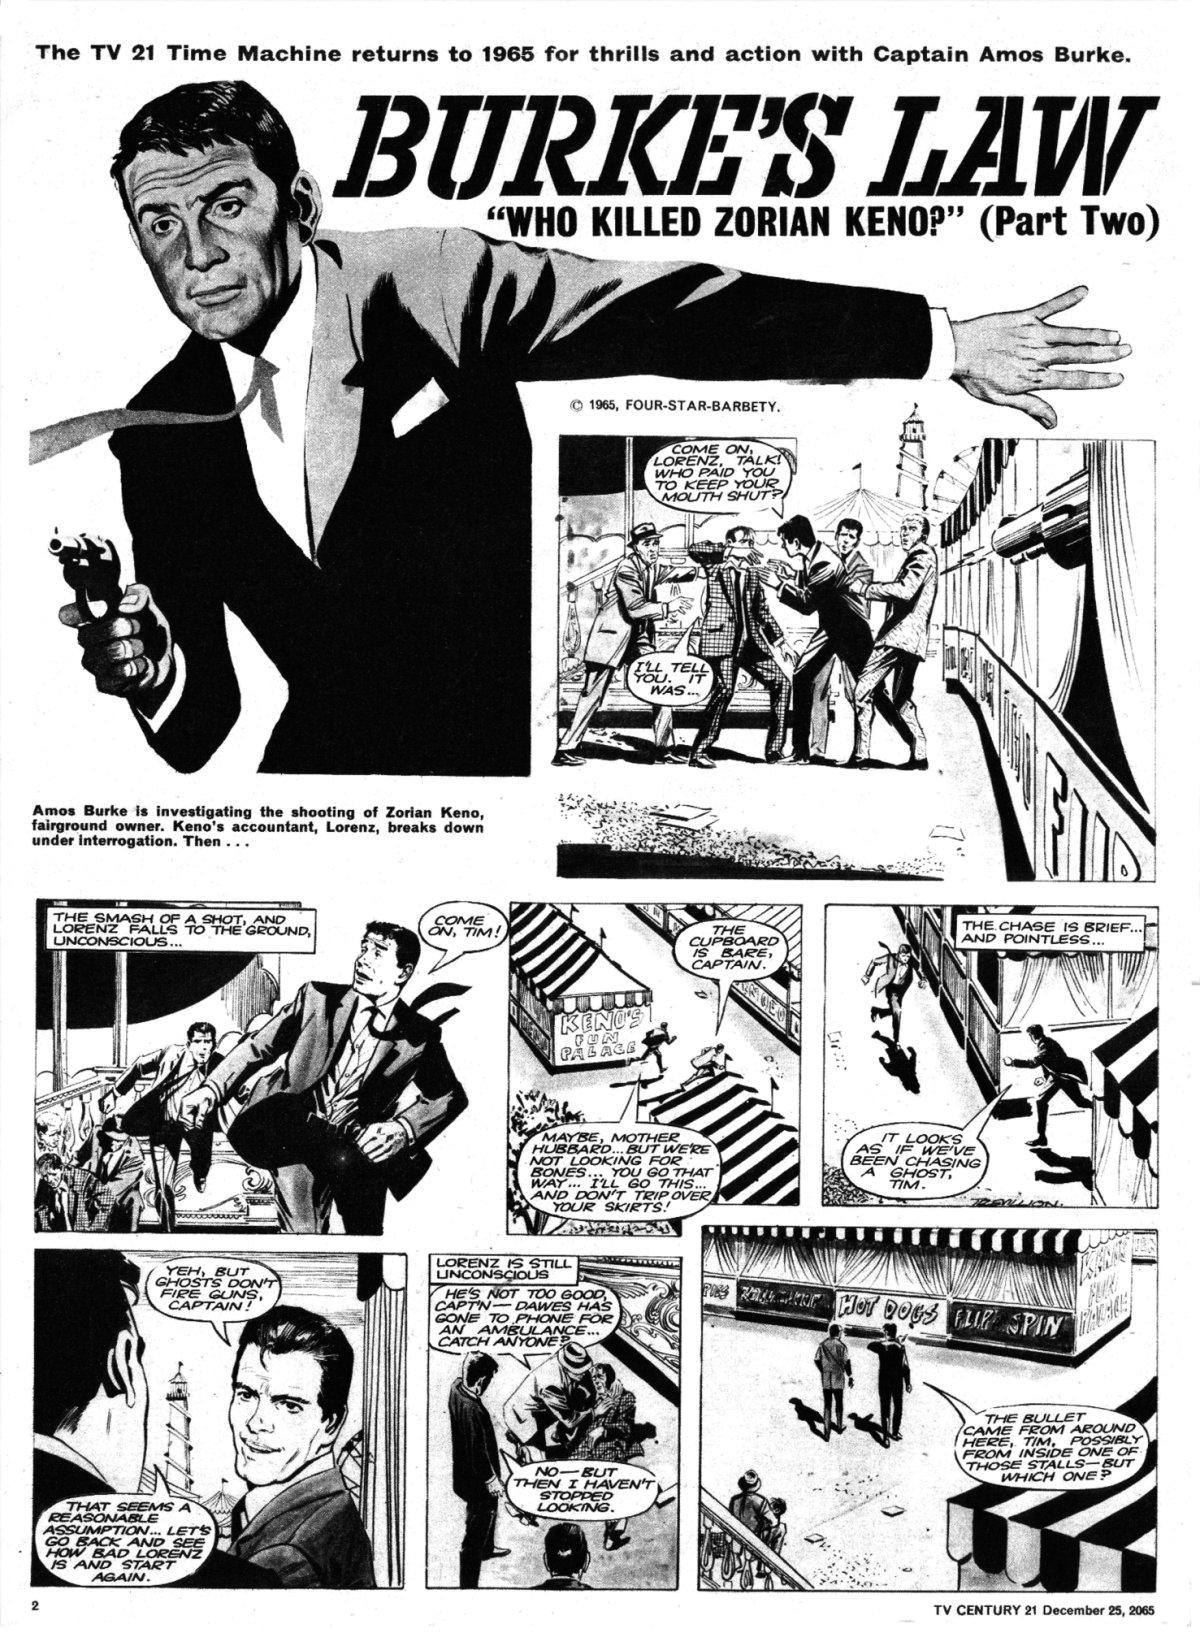 Read online TV Century 21 (TV 21) comic -  Issue #49 - 2